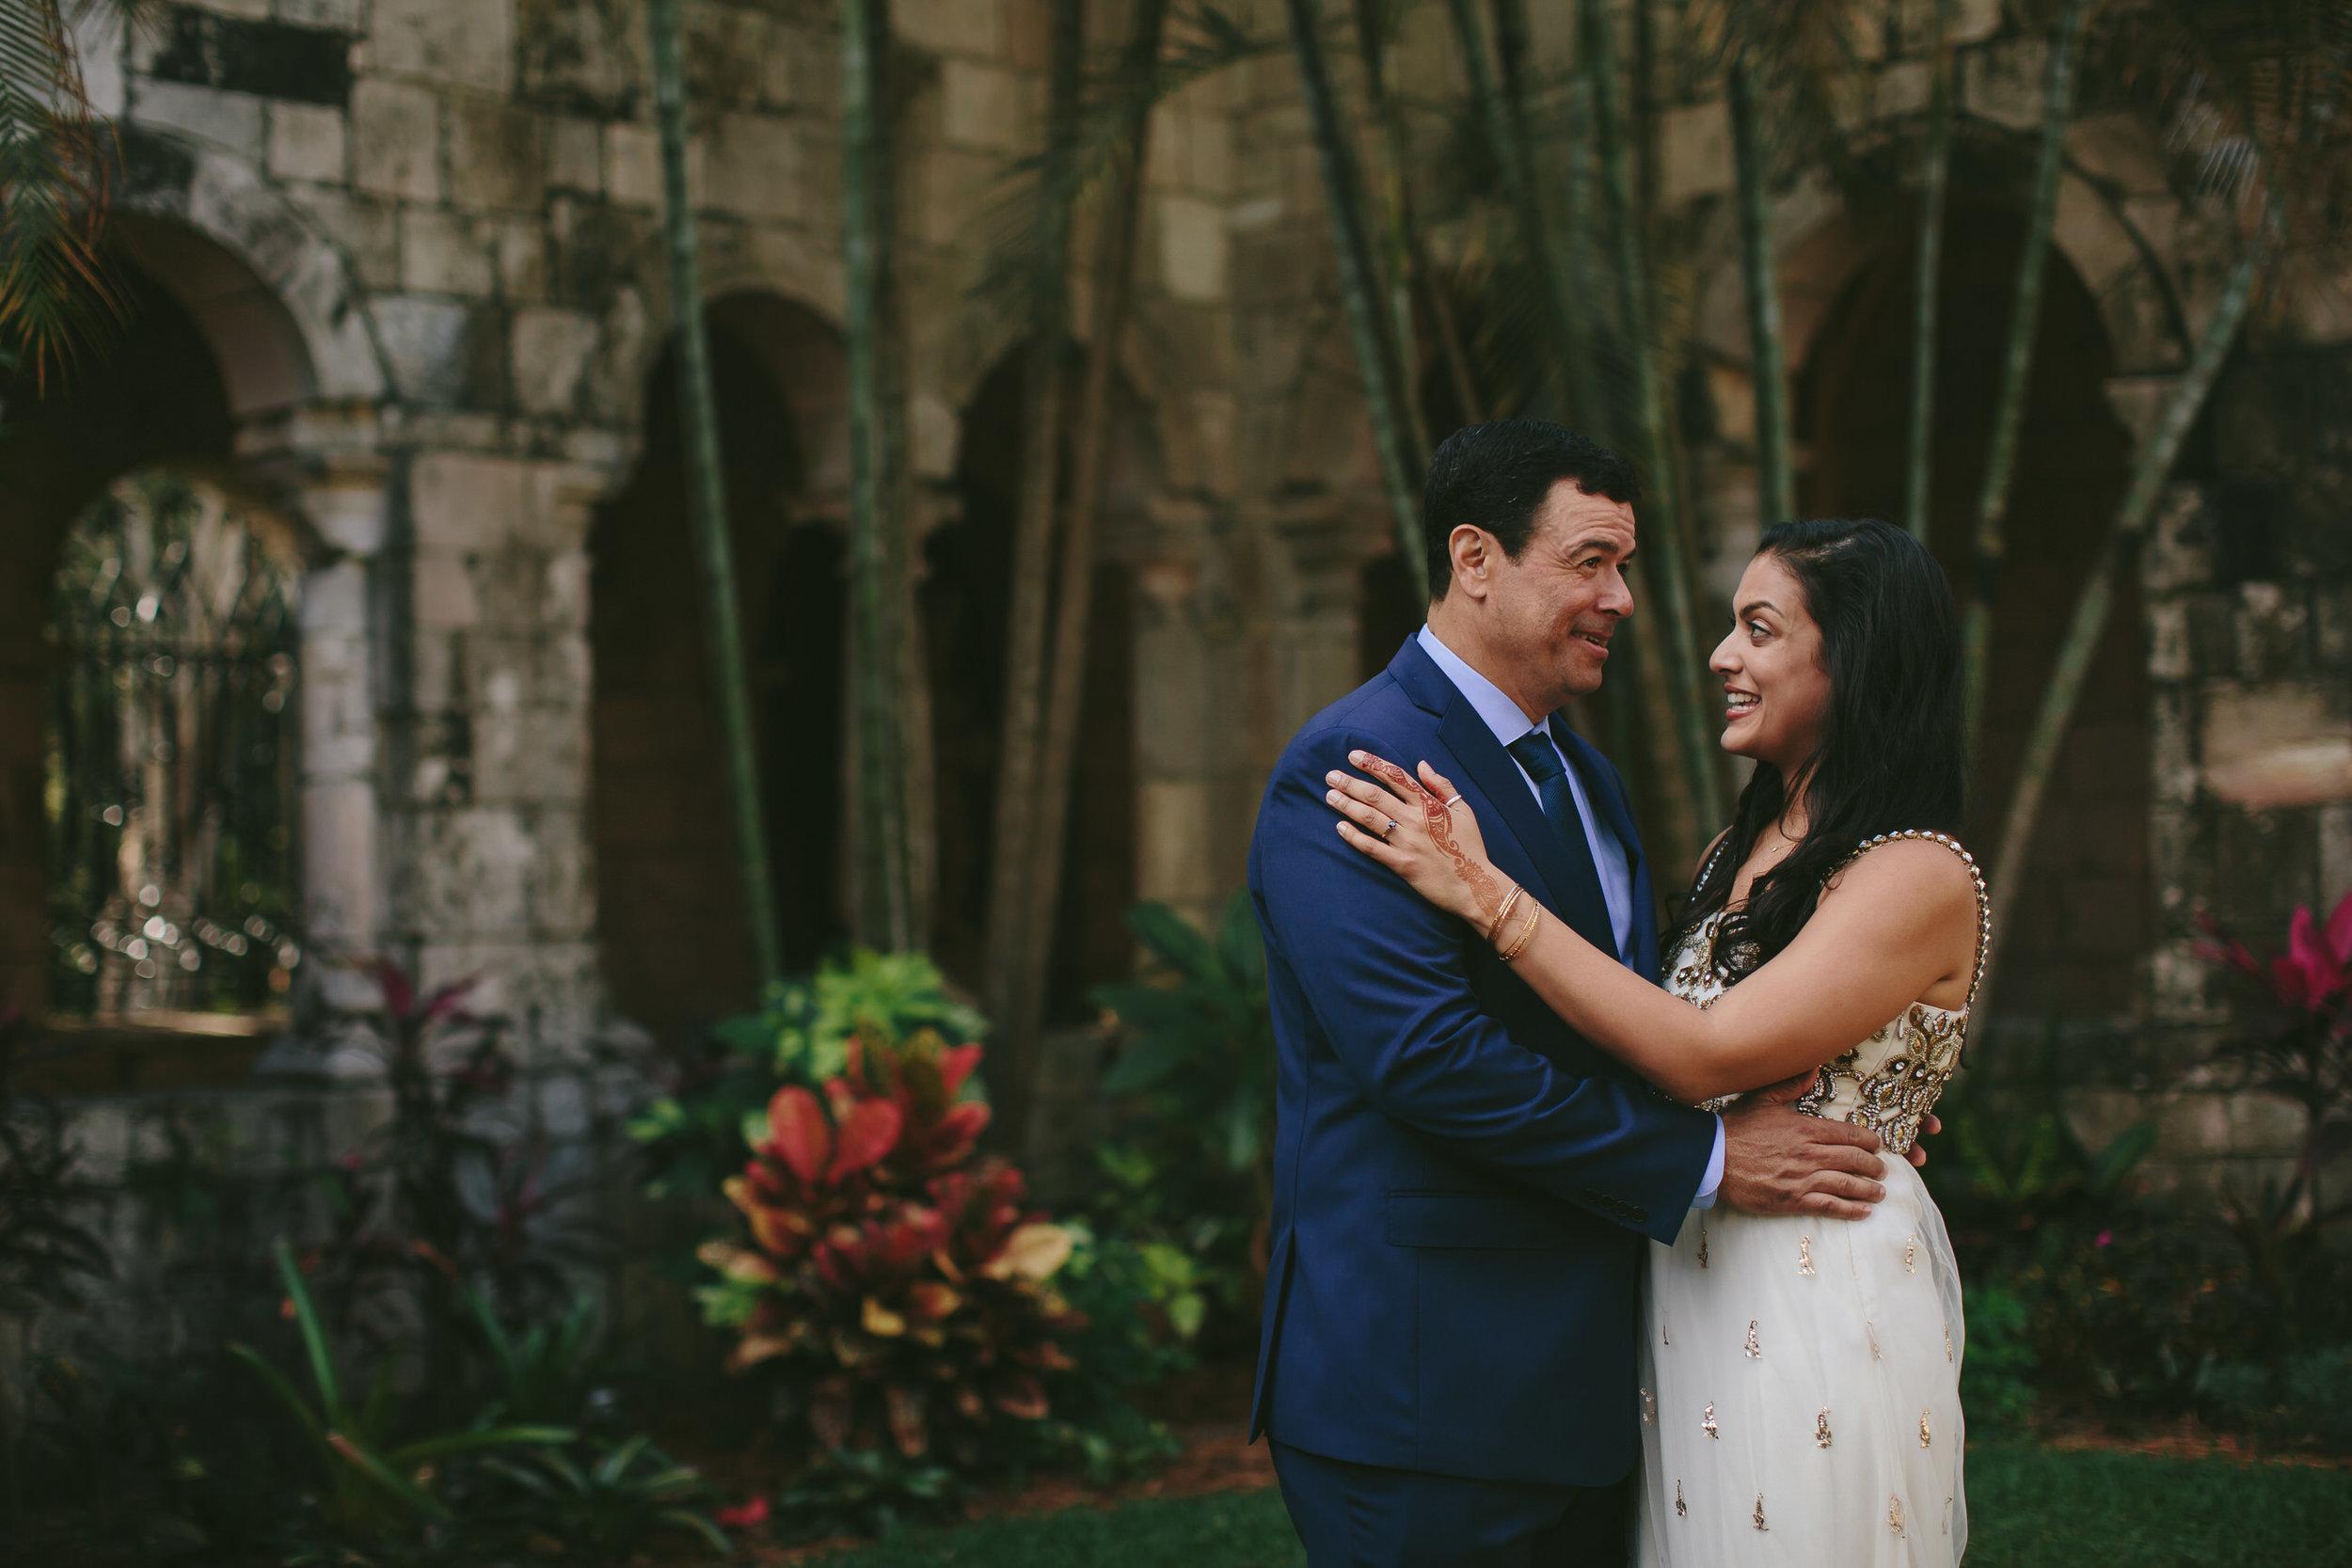 couple-wedding-day-bride-groom-tiny-house-photo-destination-wedding-photographer.jpg